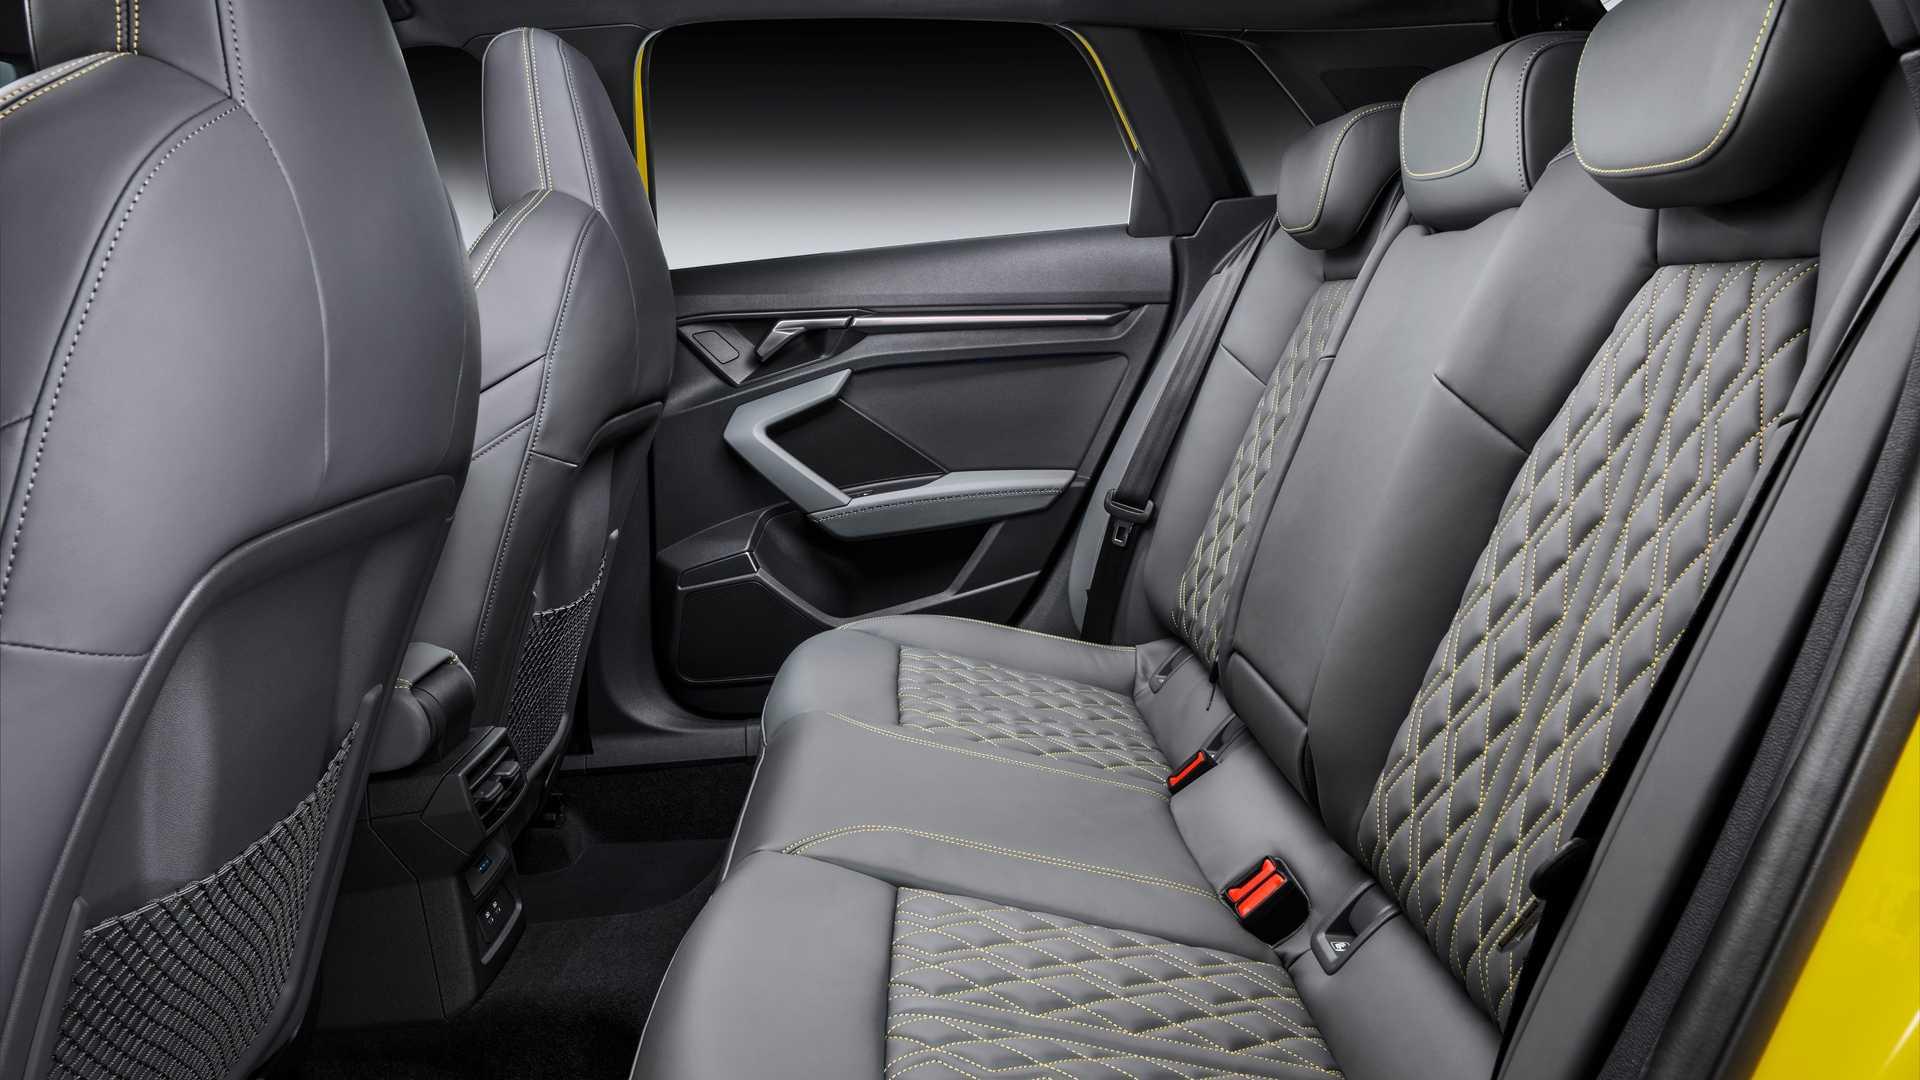 2022 Volkswagen Golf R vs. Audi S3 Comparison Ends With ...